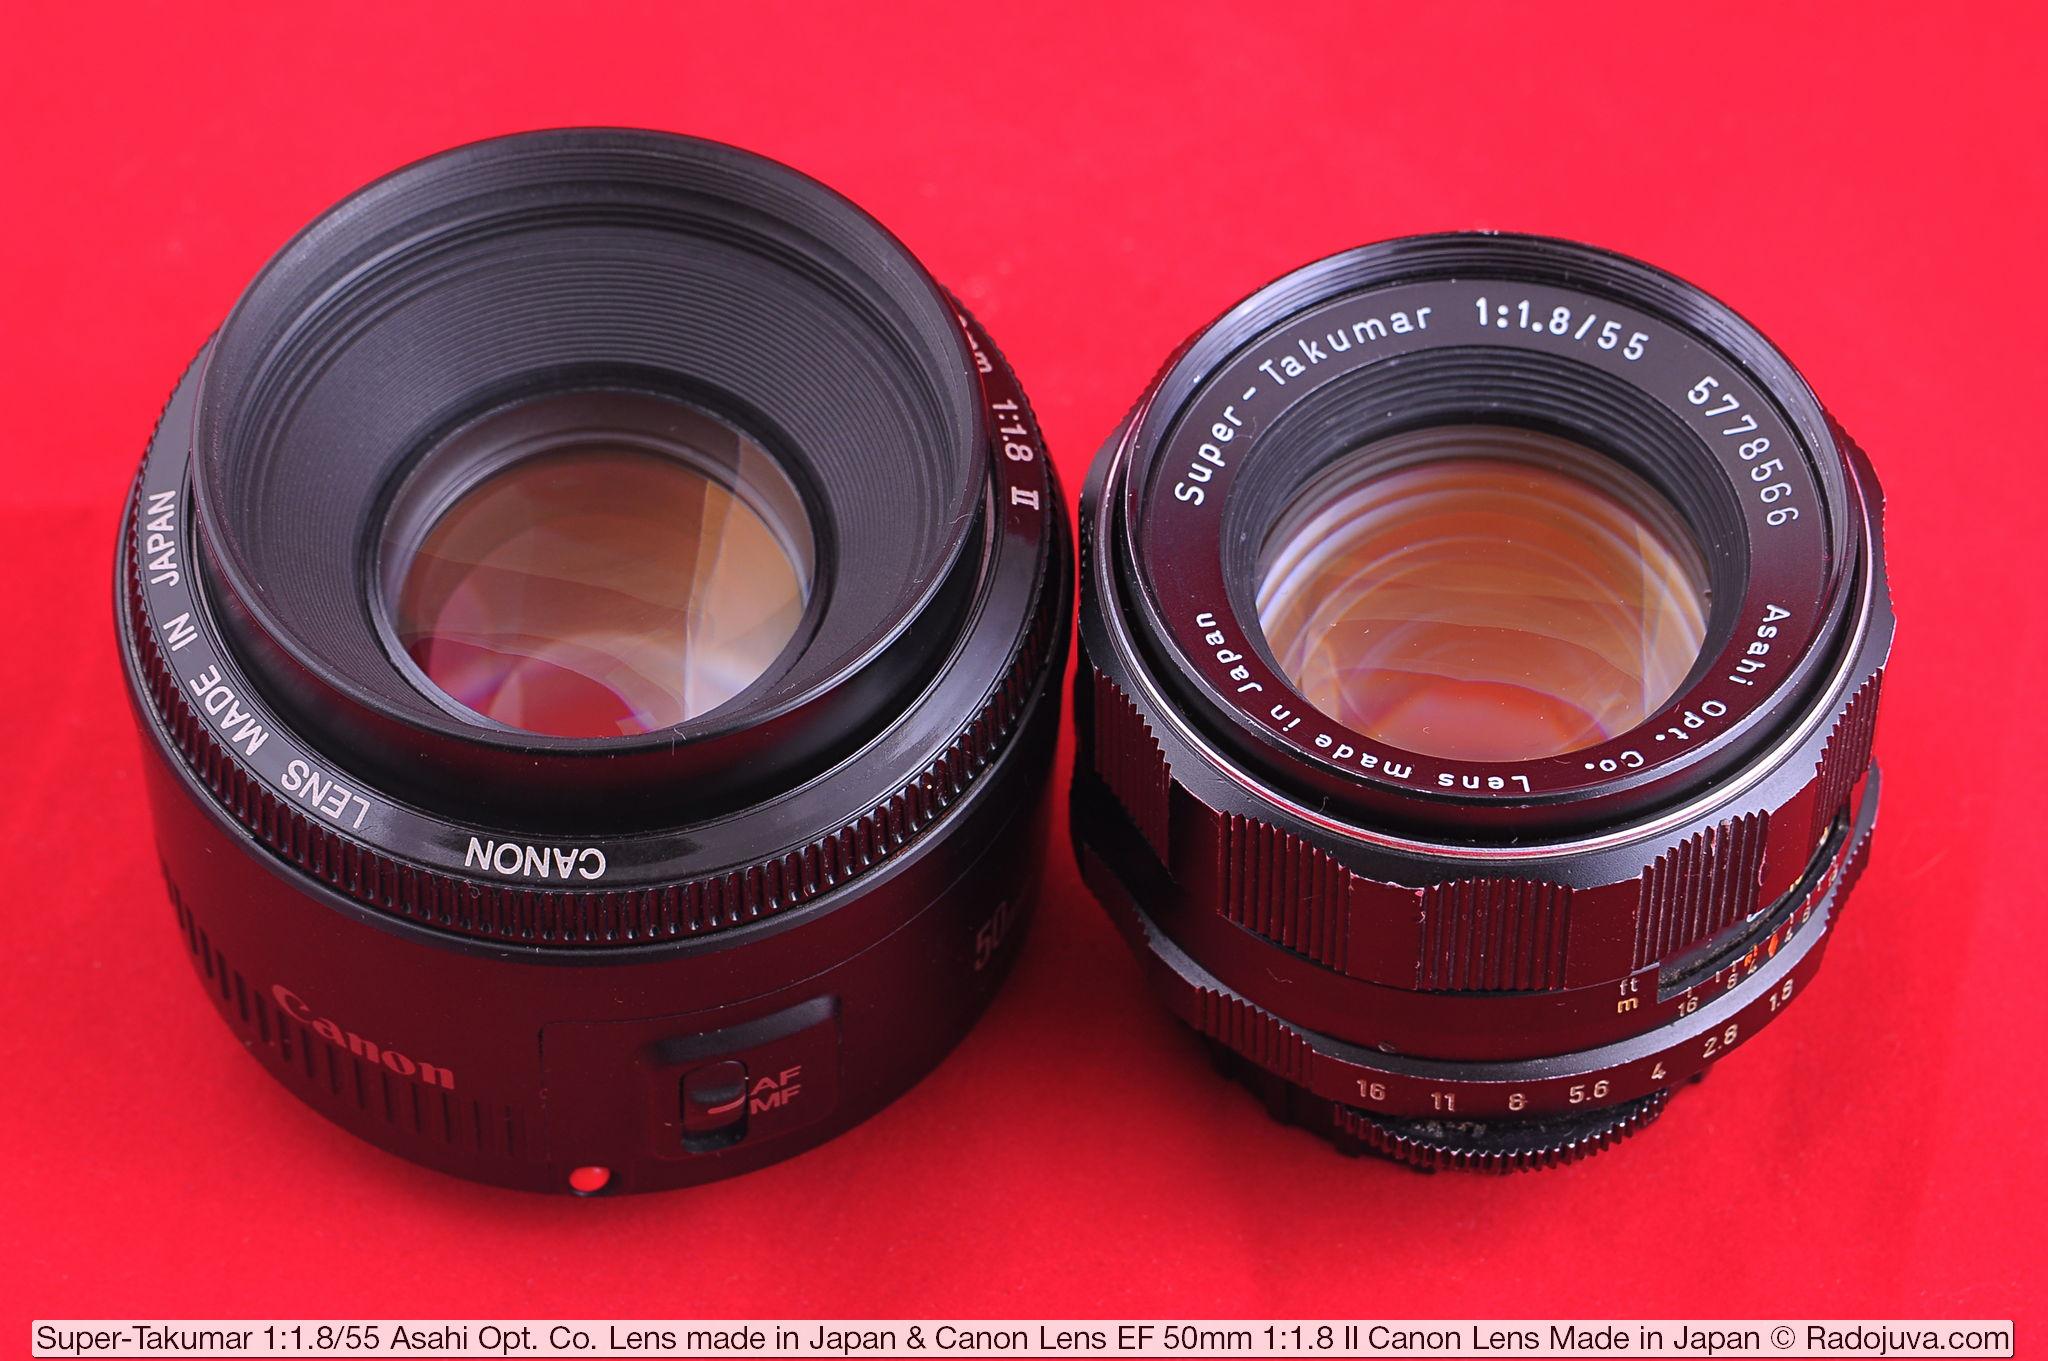 Объективы Super-Takumar 1:1.8/55 Asahi Opt. Co. Lens made in Japan и Canon Lens EF 50mm 1:1.8 II Canon Lens Made in Japan